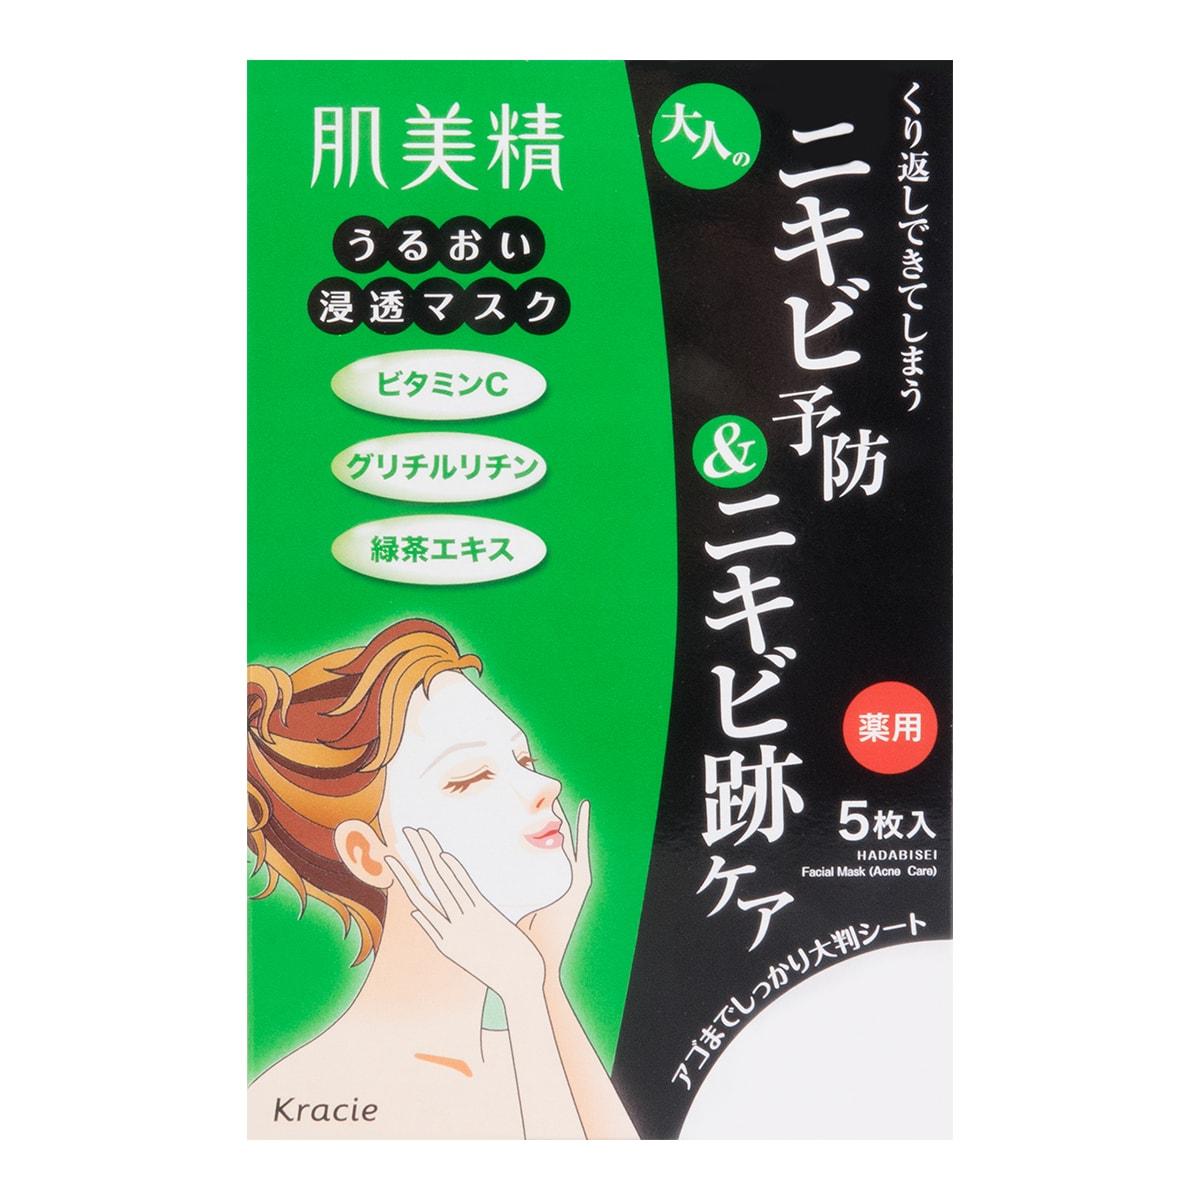 KRACIE HADABISEI Moisturizing Acne Face Mask  5sheets